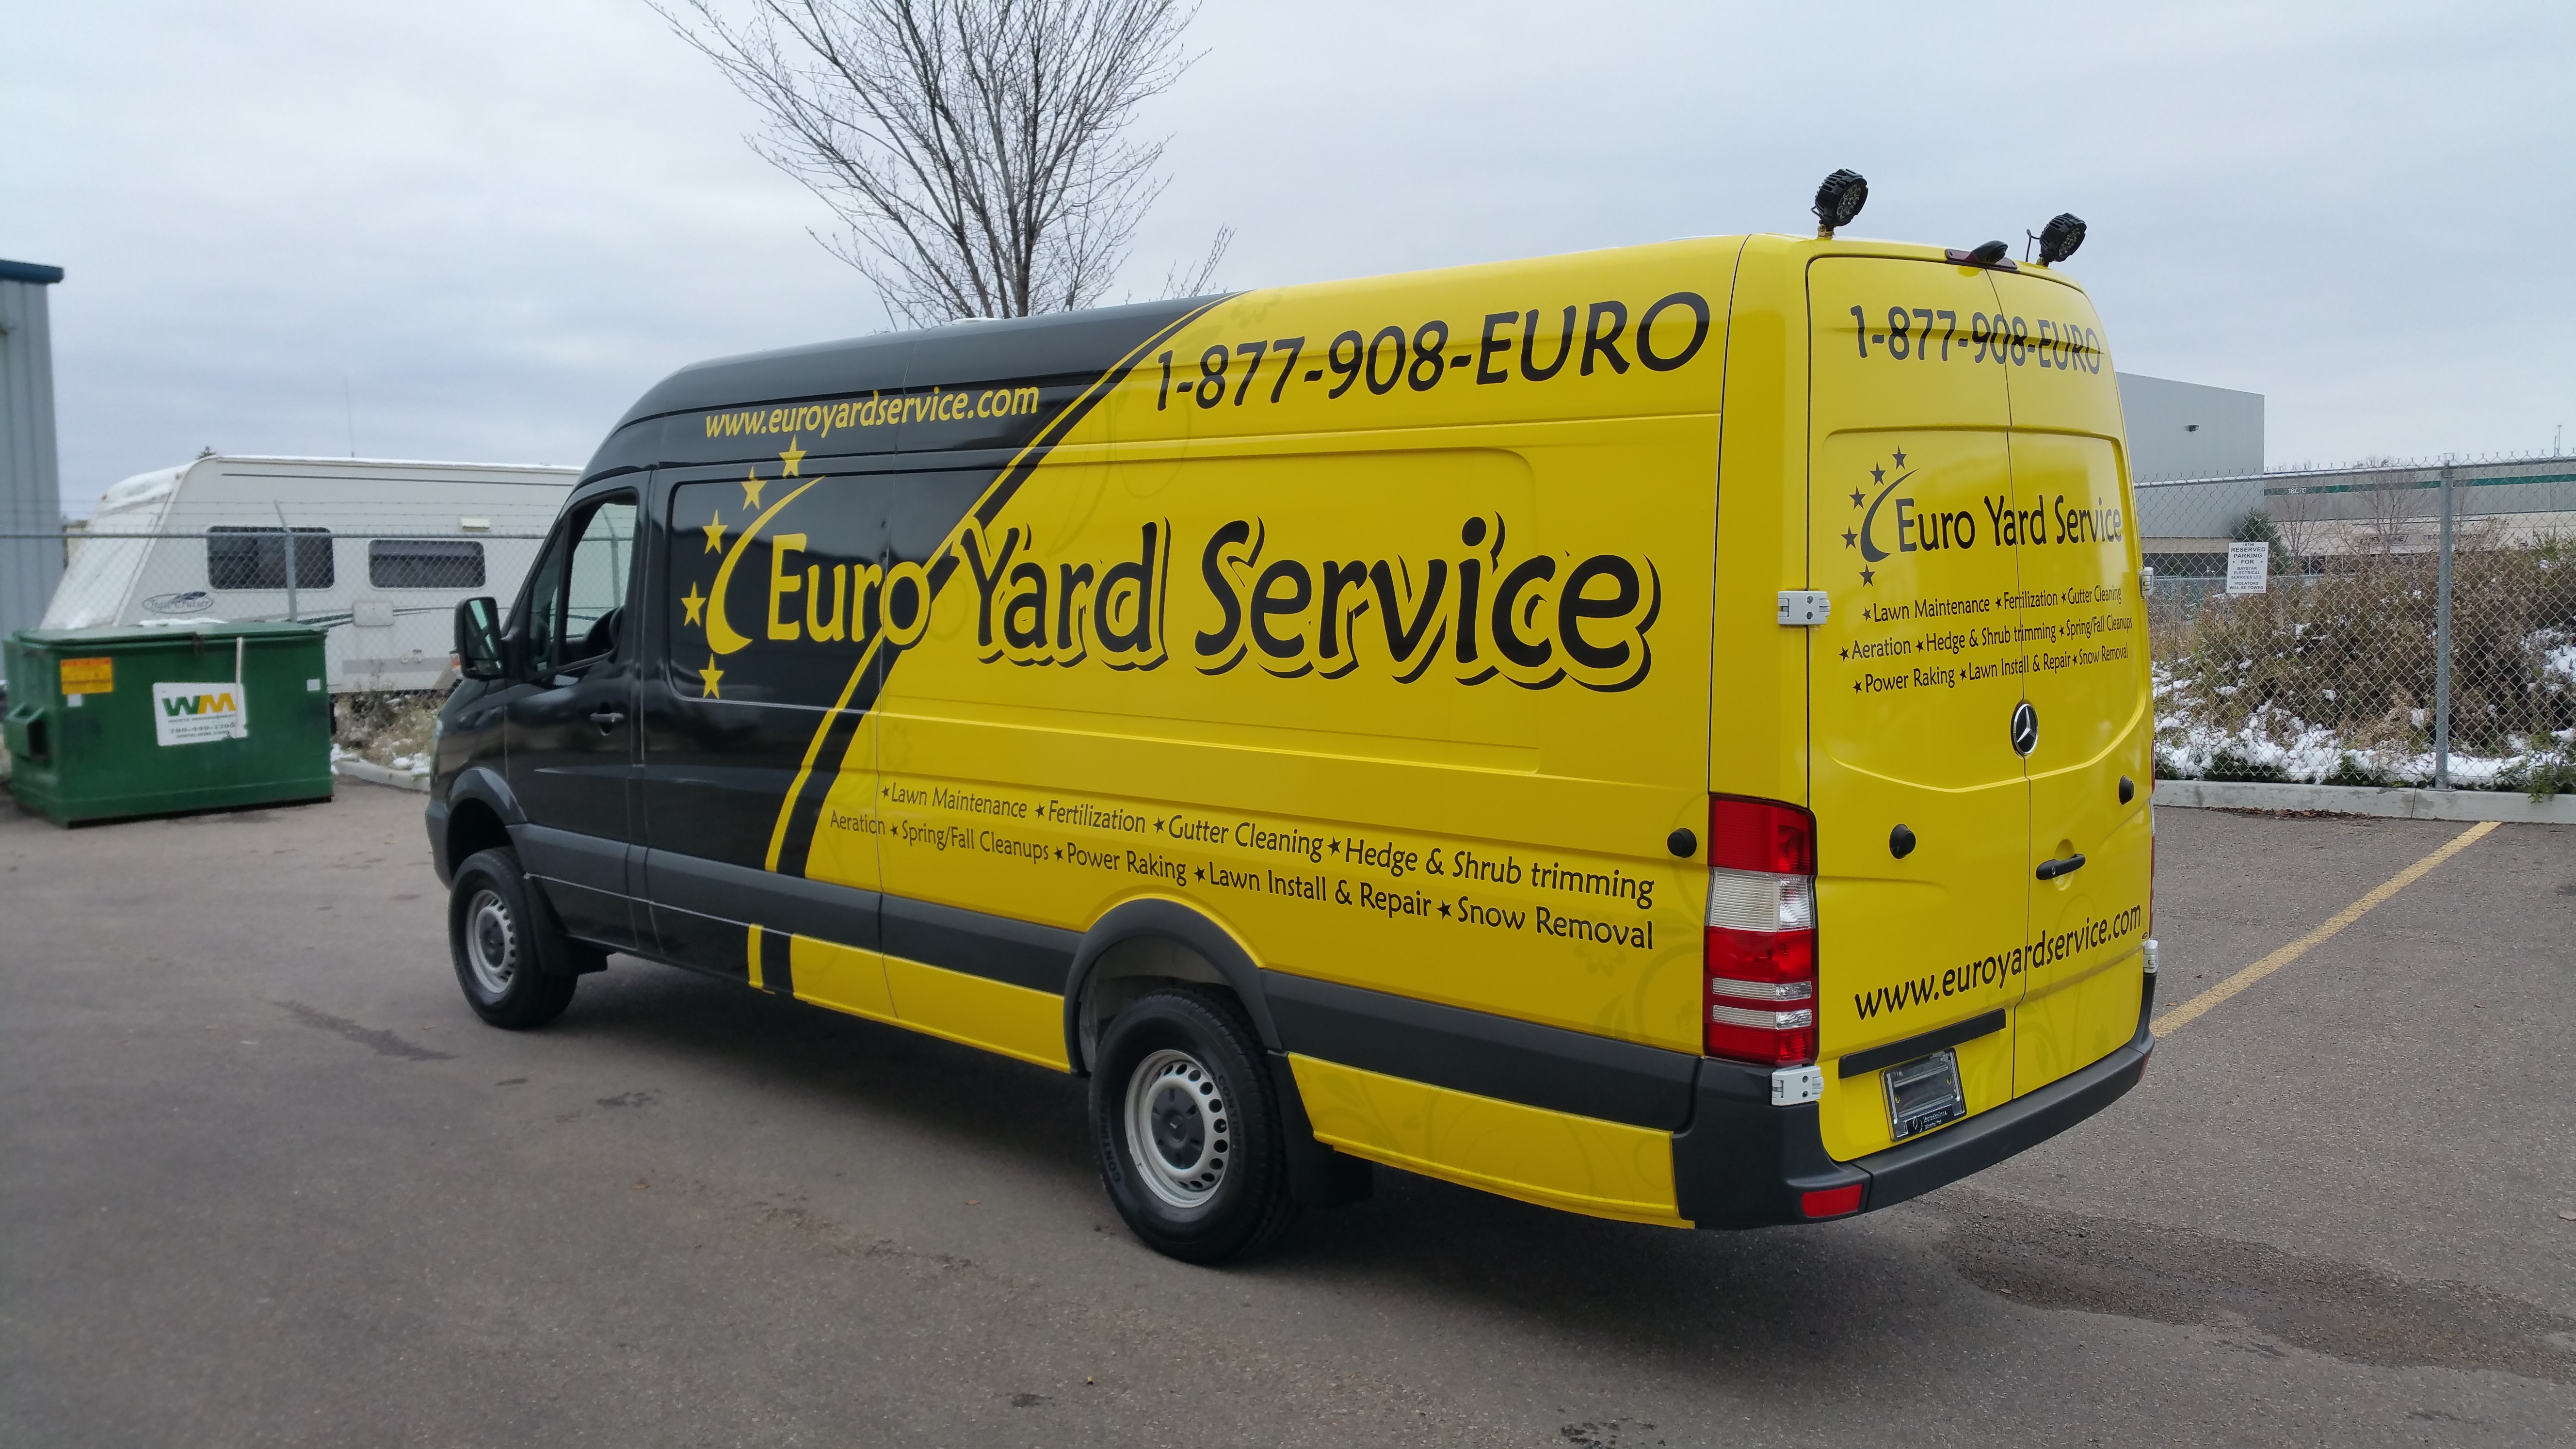 Euro Yard Service sprinter wrap